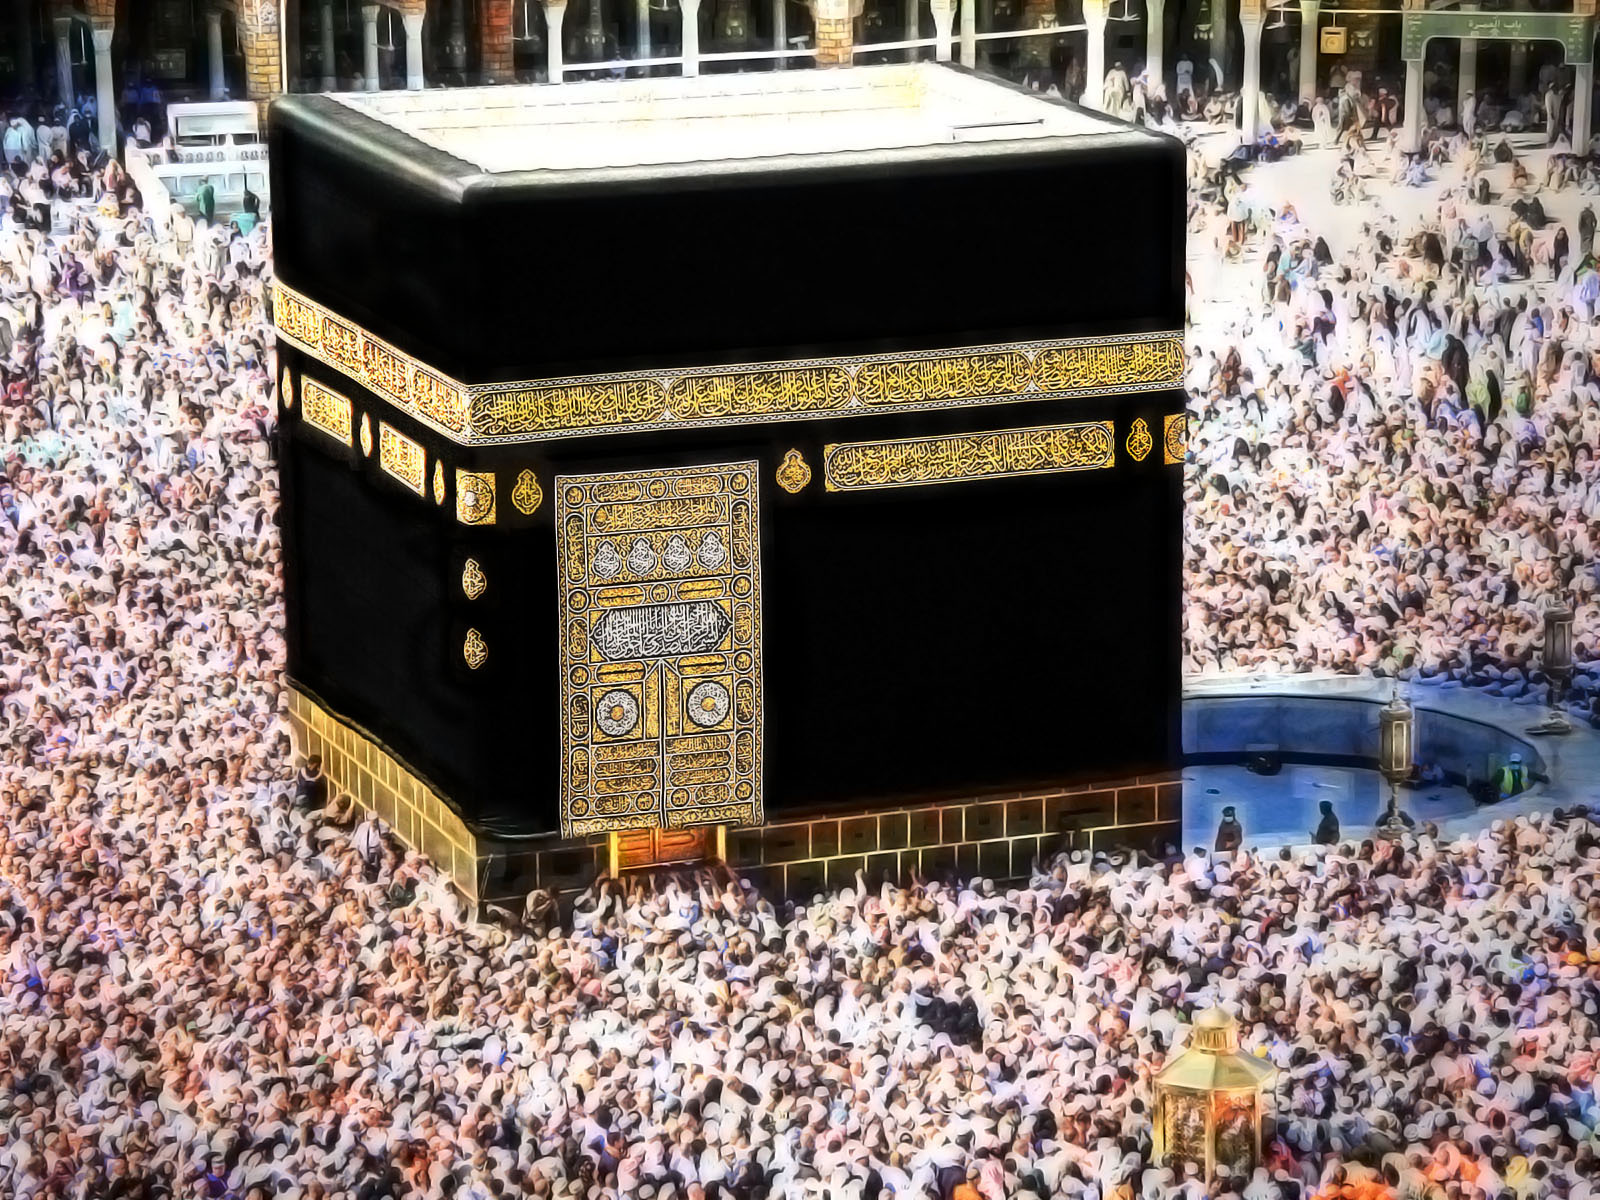 Tunggu Haji Sampai 11 Tahun